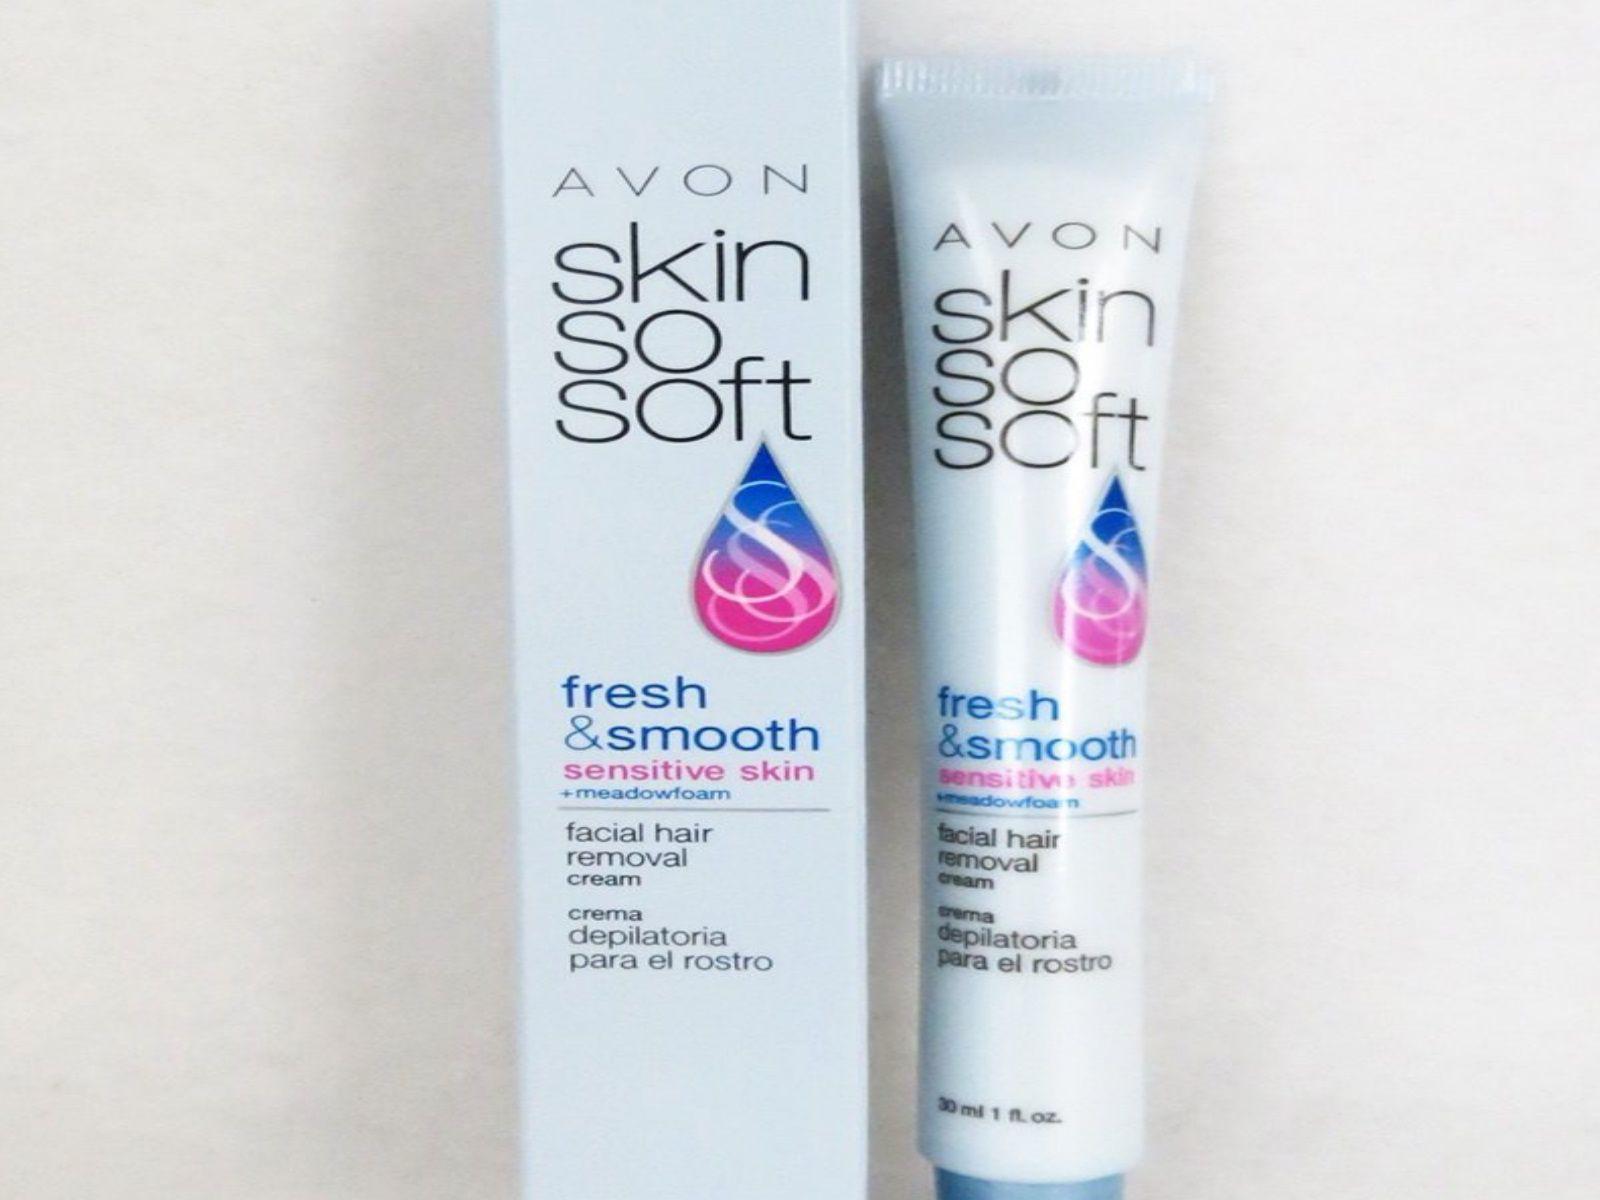 Avon Skin So Soft Facial Hair Removal Cream Review